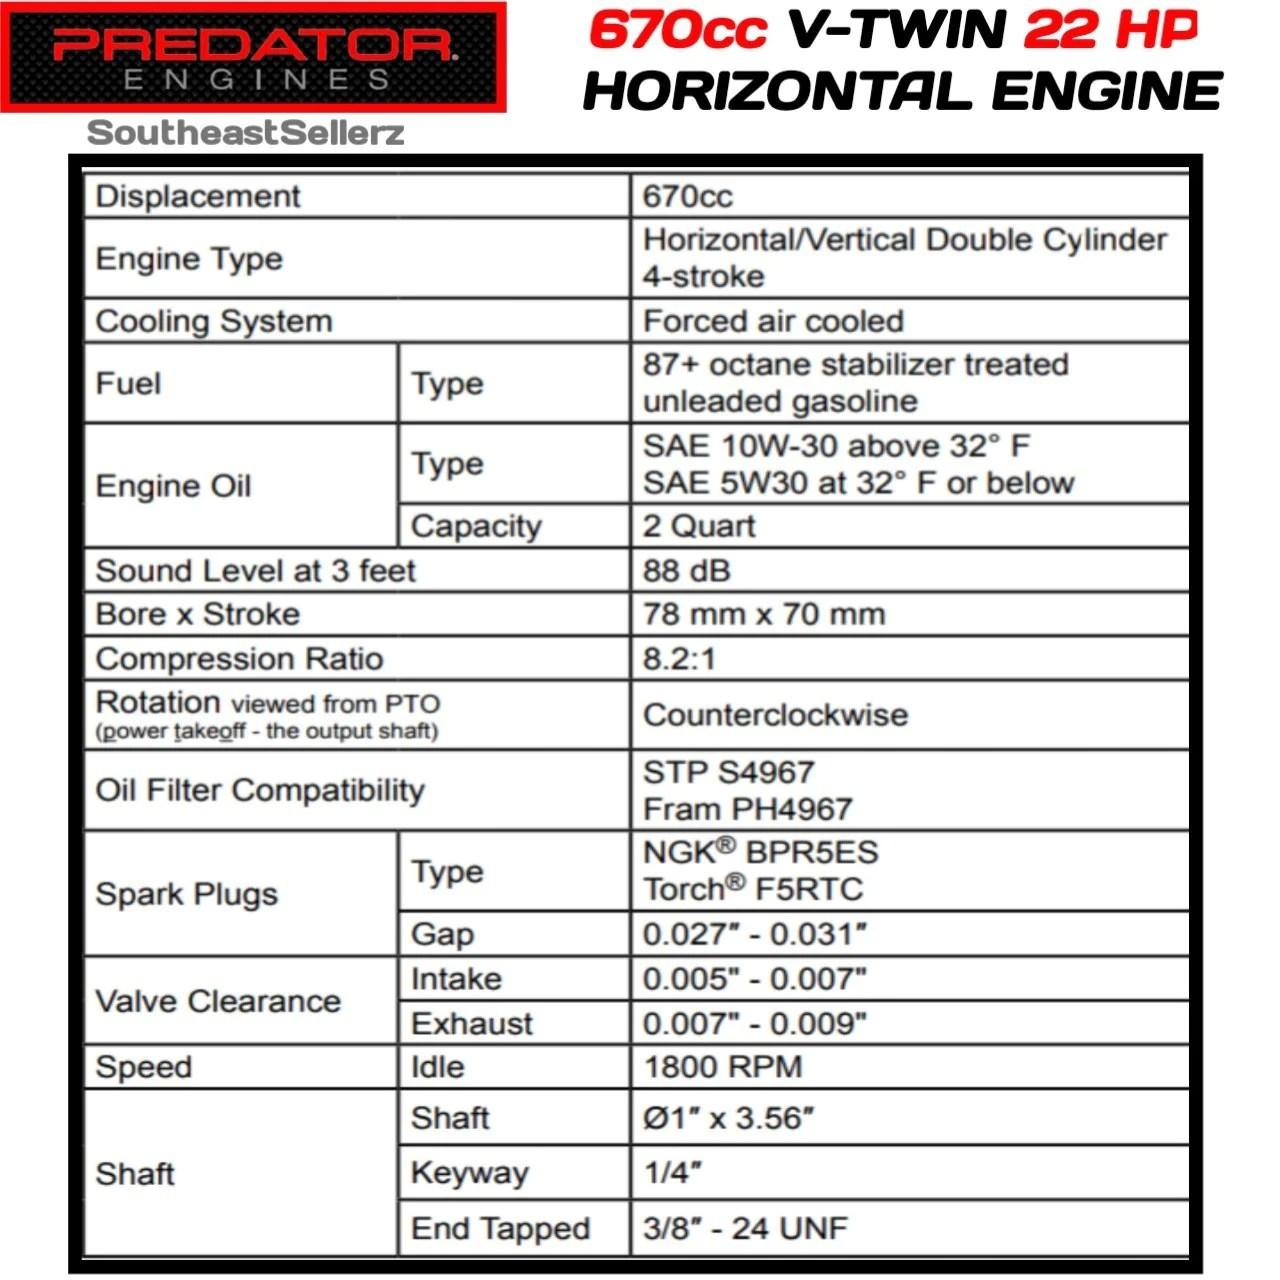 Horrible Hp Horizontal Shaft Gas Engine Epa Predator Hp Horizontal Shaft Gas Engine Epa Predator Gazily 10w30 V 5w30 Oil 10w30 Vs 5w30 Jeep houzz-03 10w30 Vs 5w30